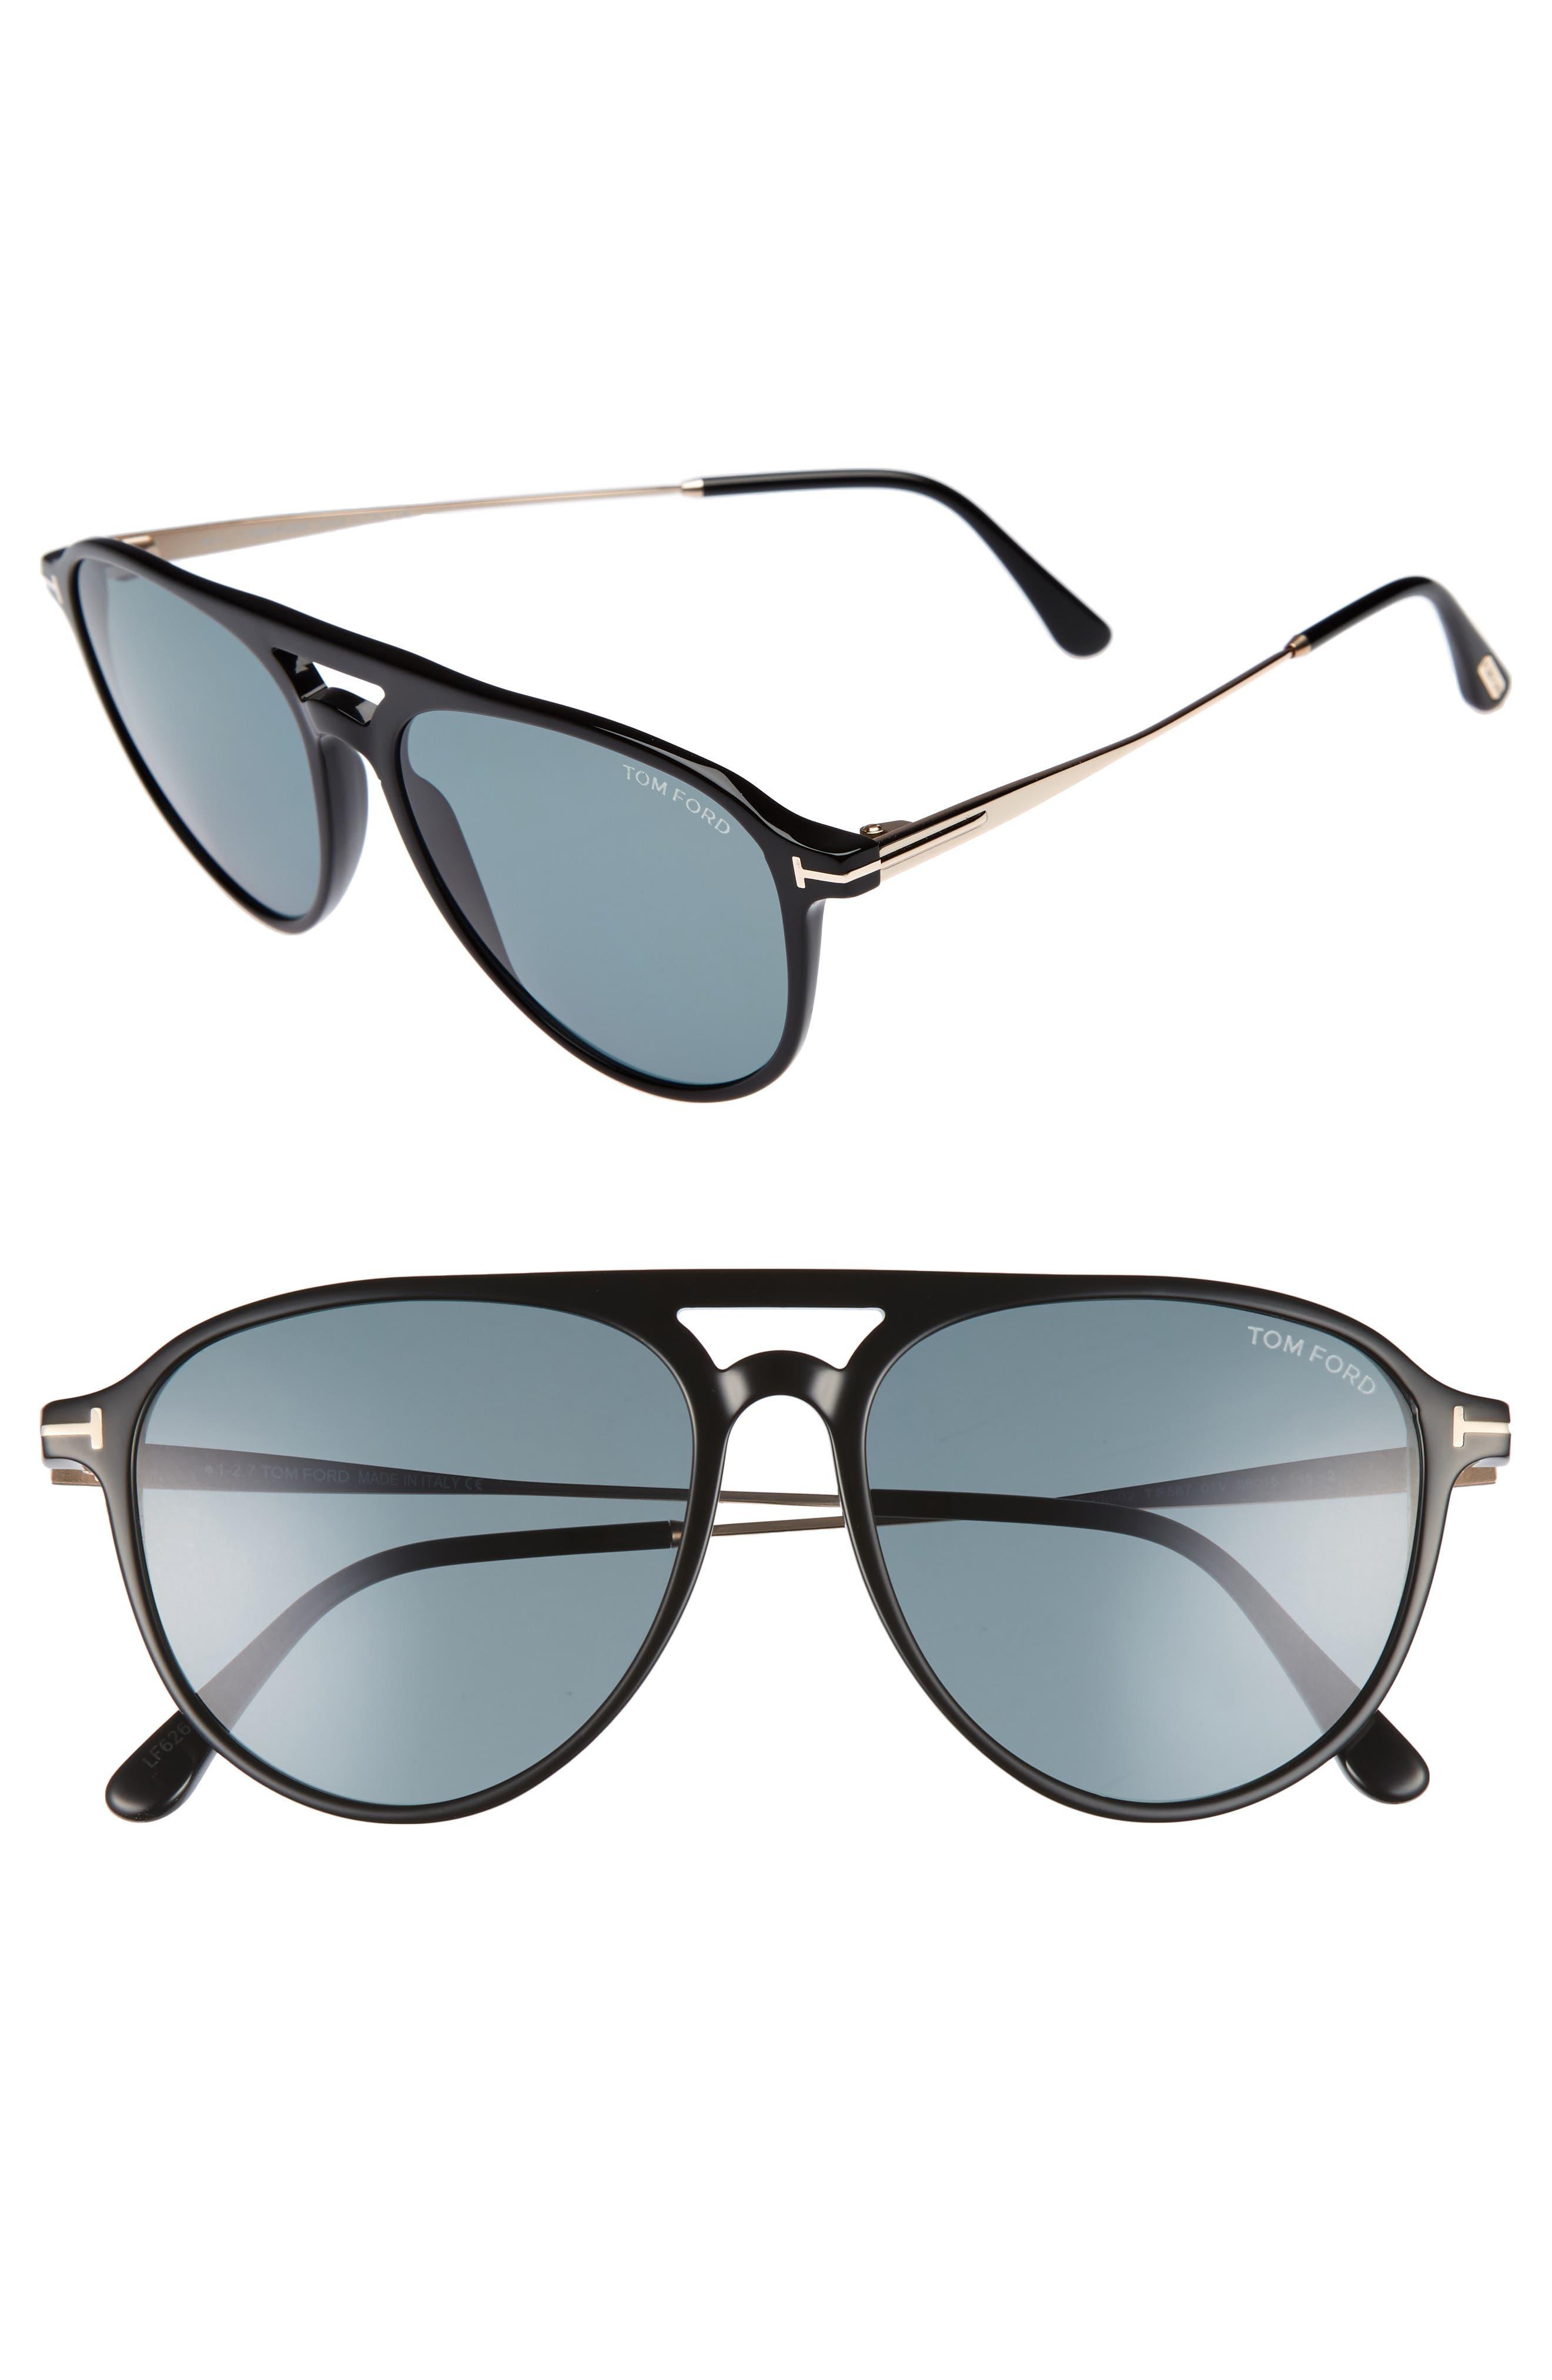 Carlo 59mm Aviator Sunglasses,                         Main,                         color, 001